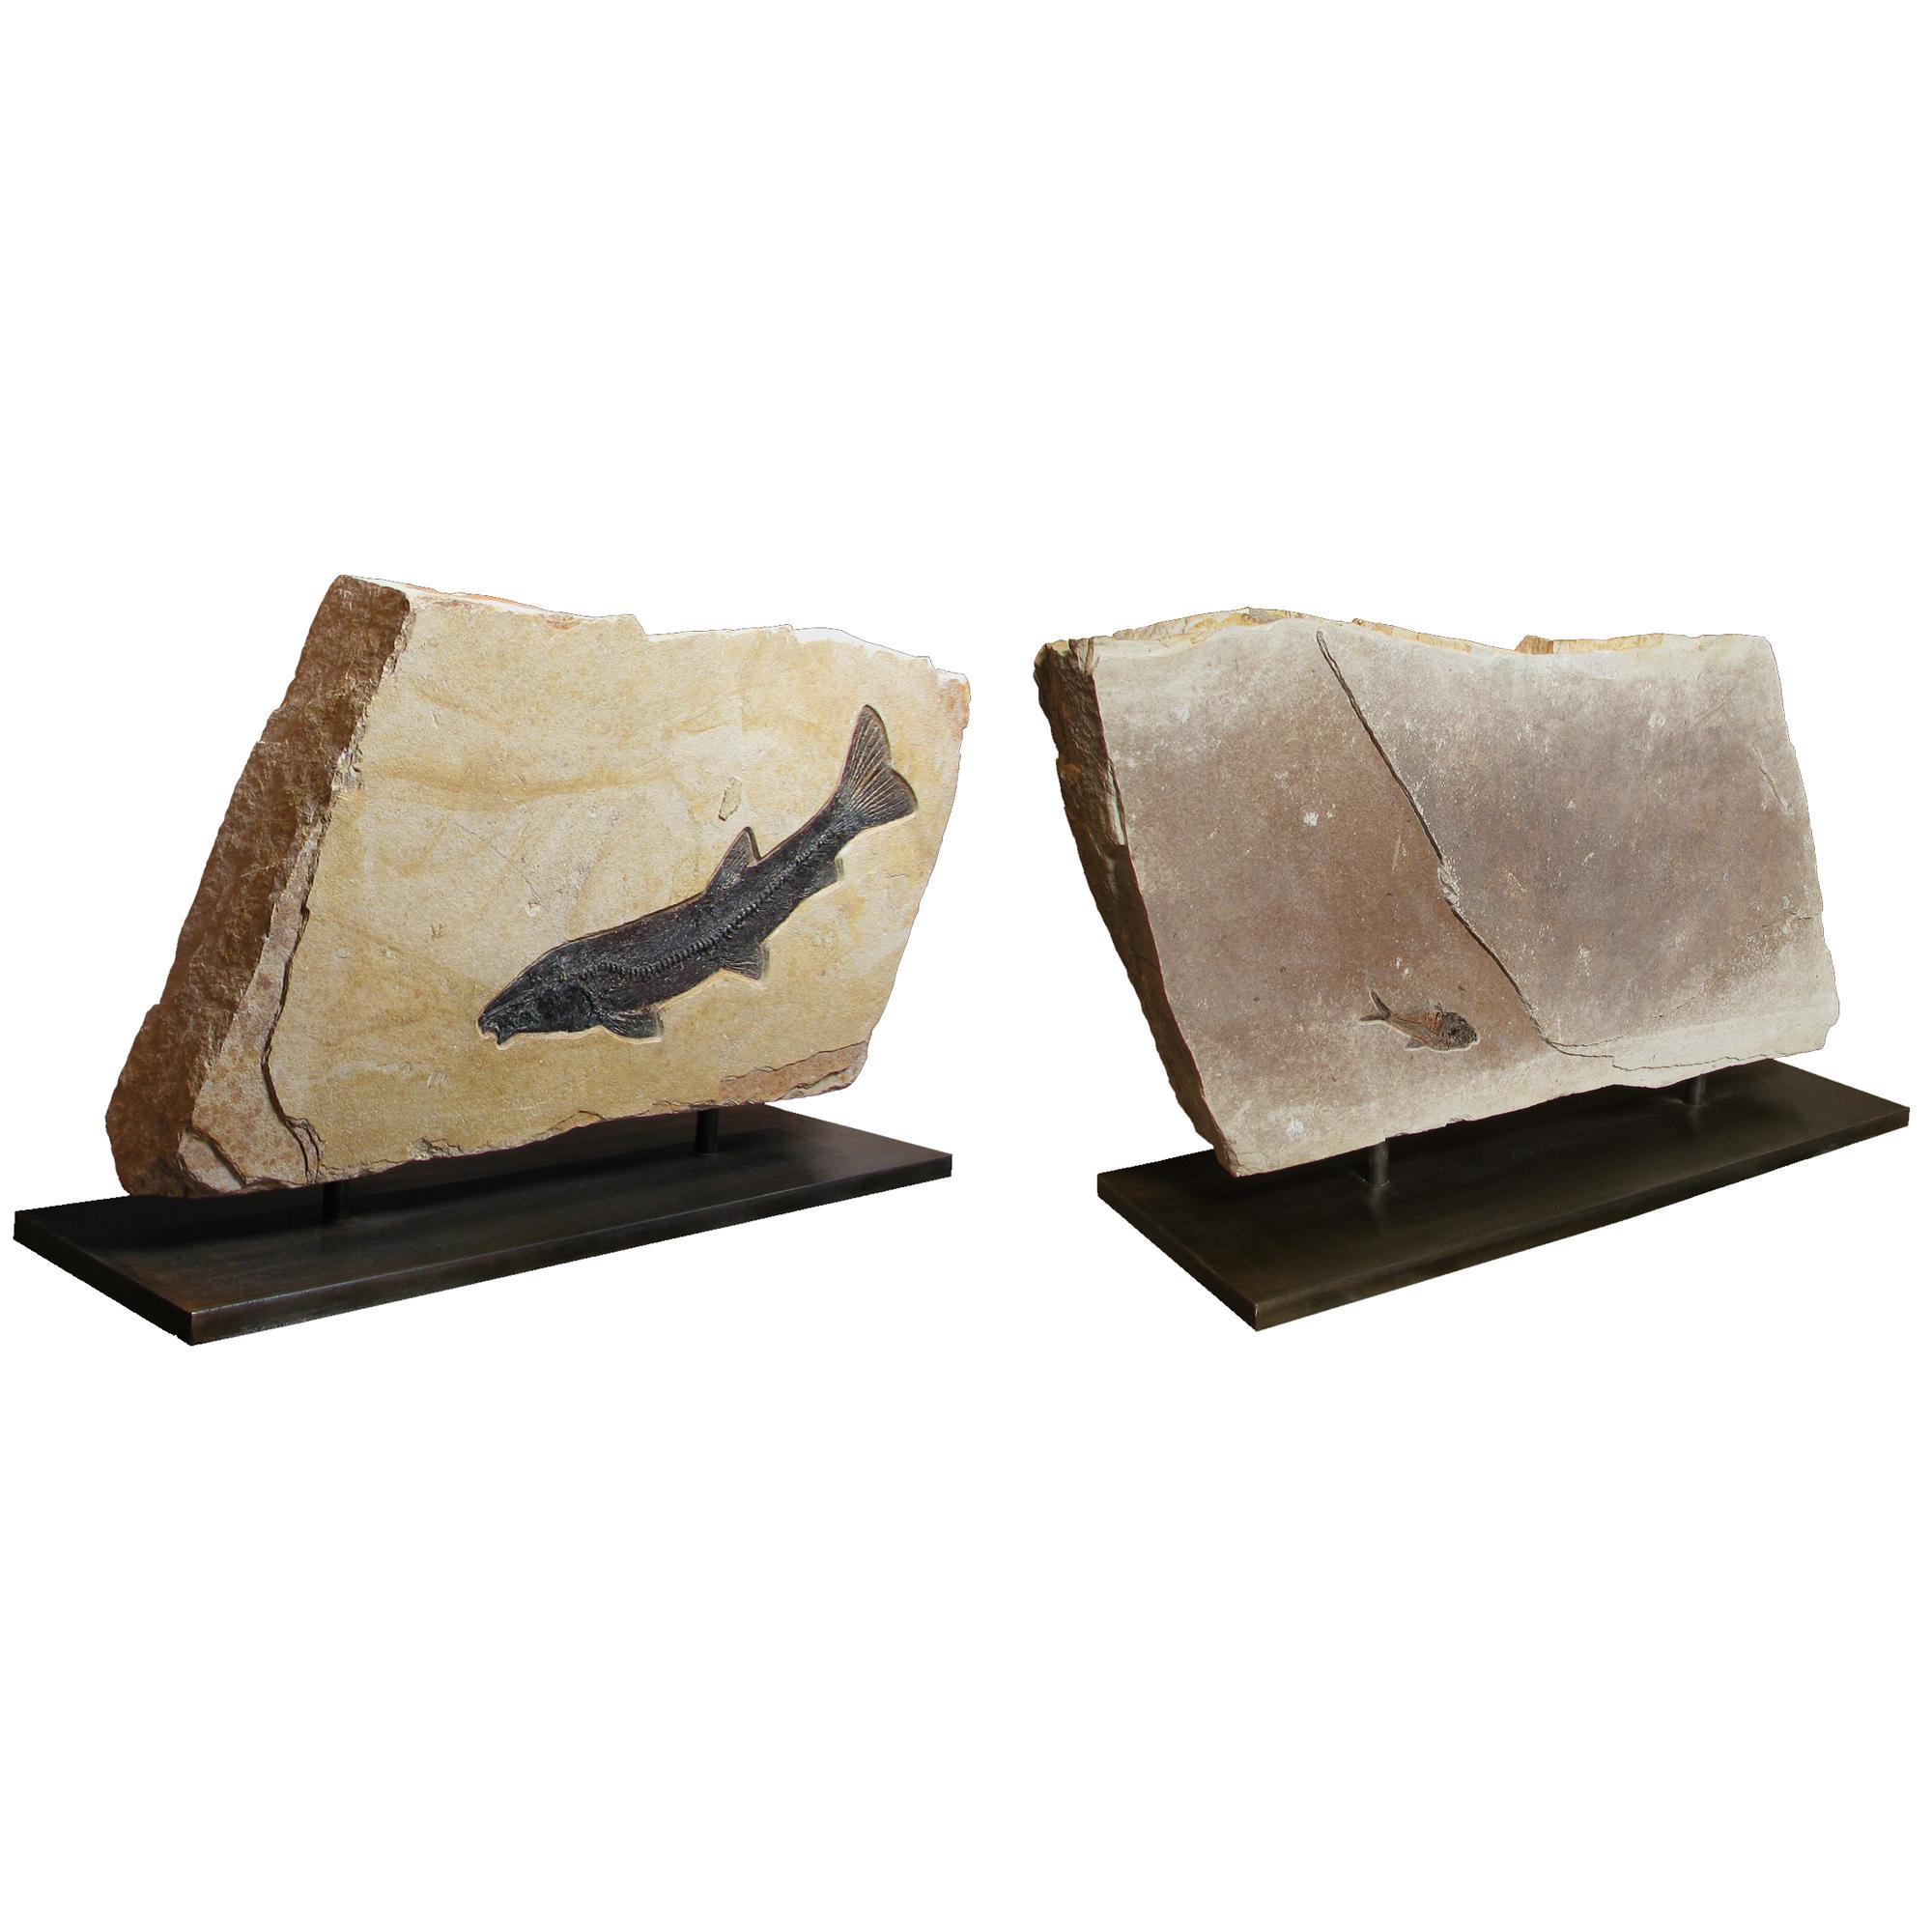 Fossil Sculpture 02_120119300s